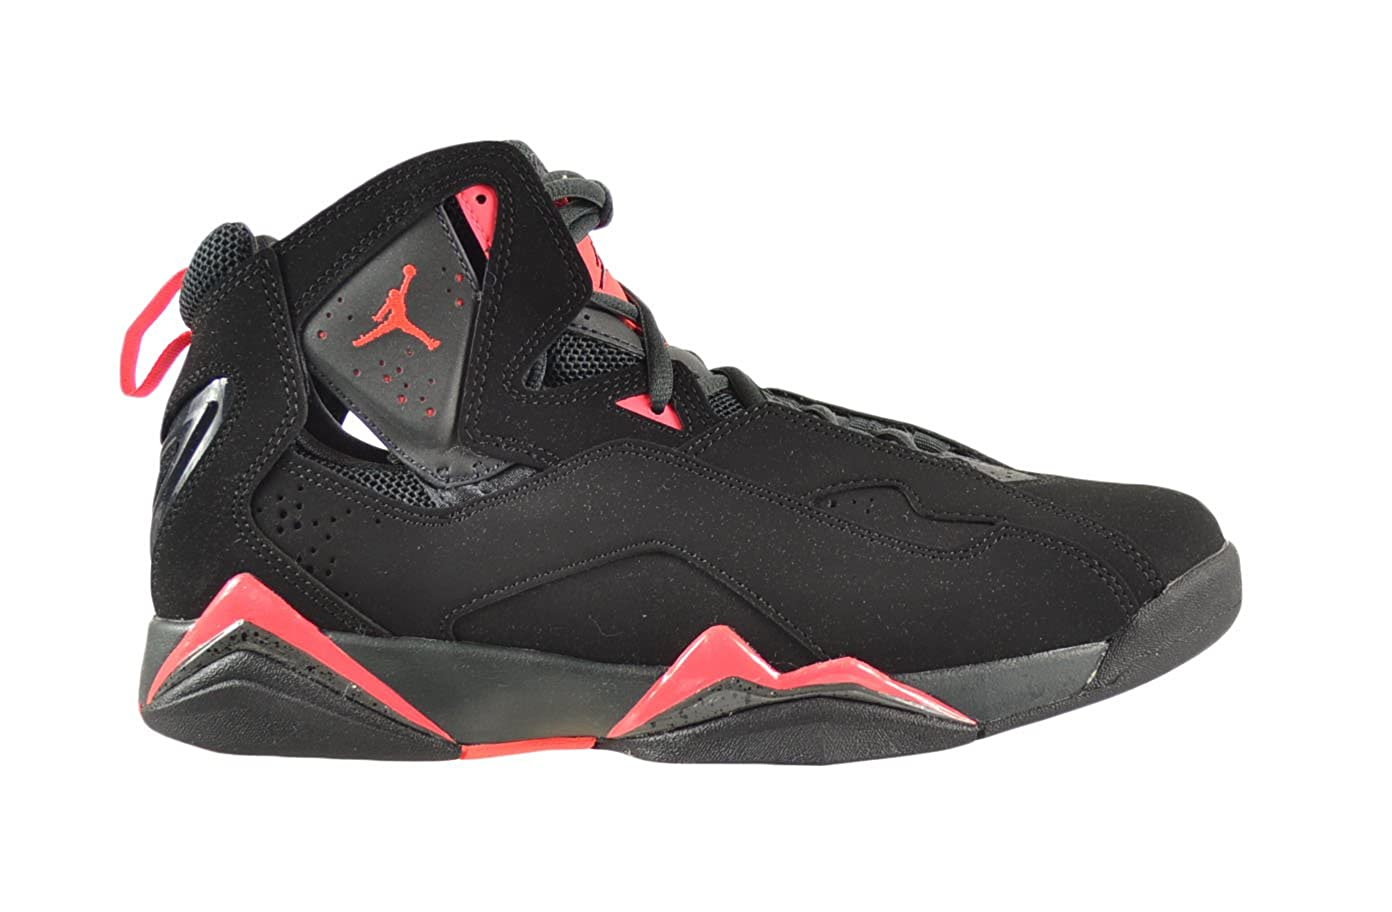 brand new 8c92b 64f13 Amazon.com   Jordan True Flight Men s Shoes Black Infrared-Anthracite  342964-023 (13 D(M) US)   Basketball